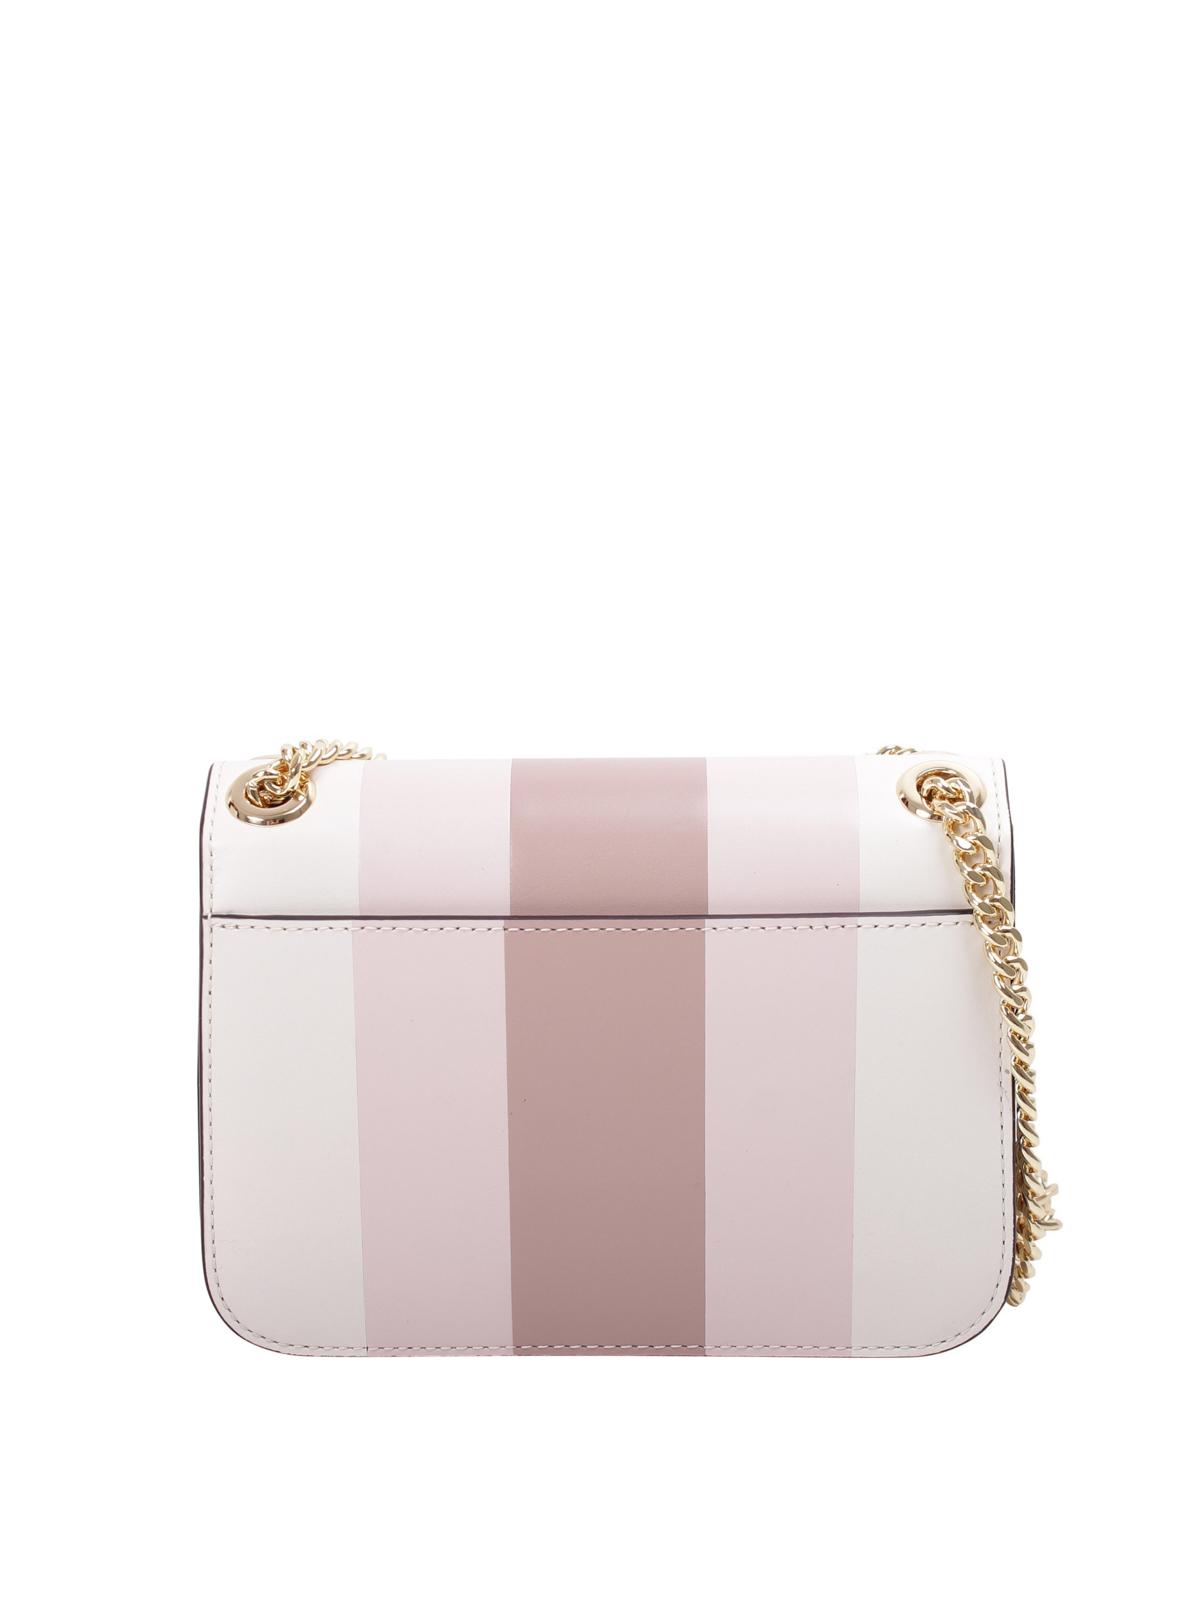 best website 86bf3 eed4b Michael Kors - Sloan striped leather small bag - cross body ...